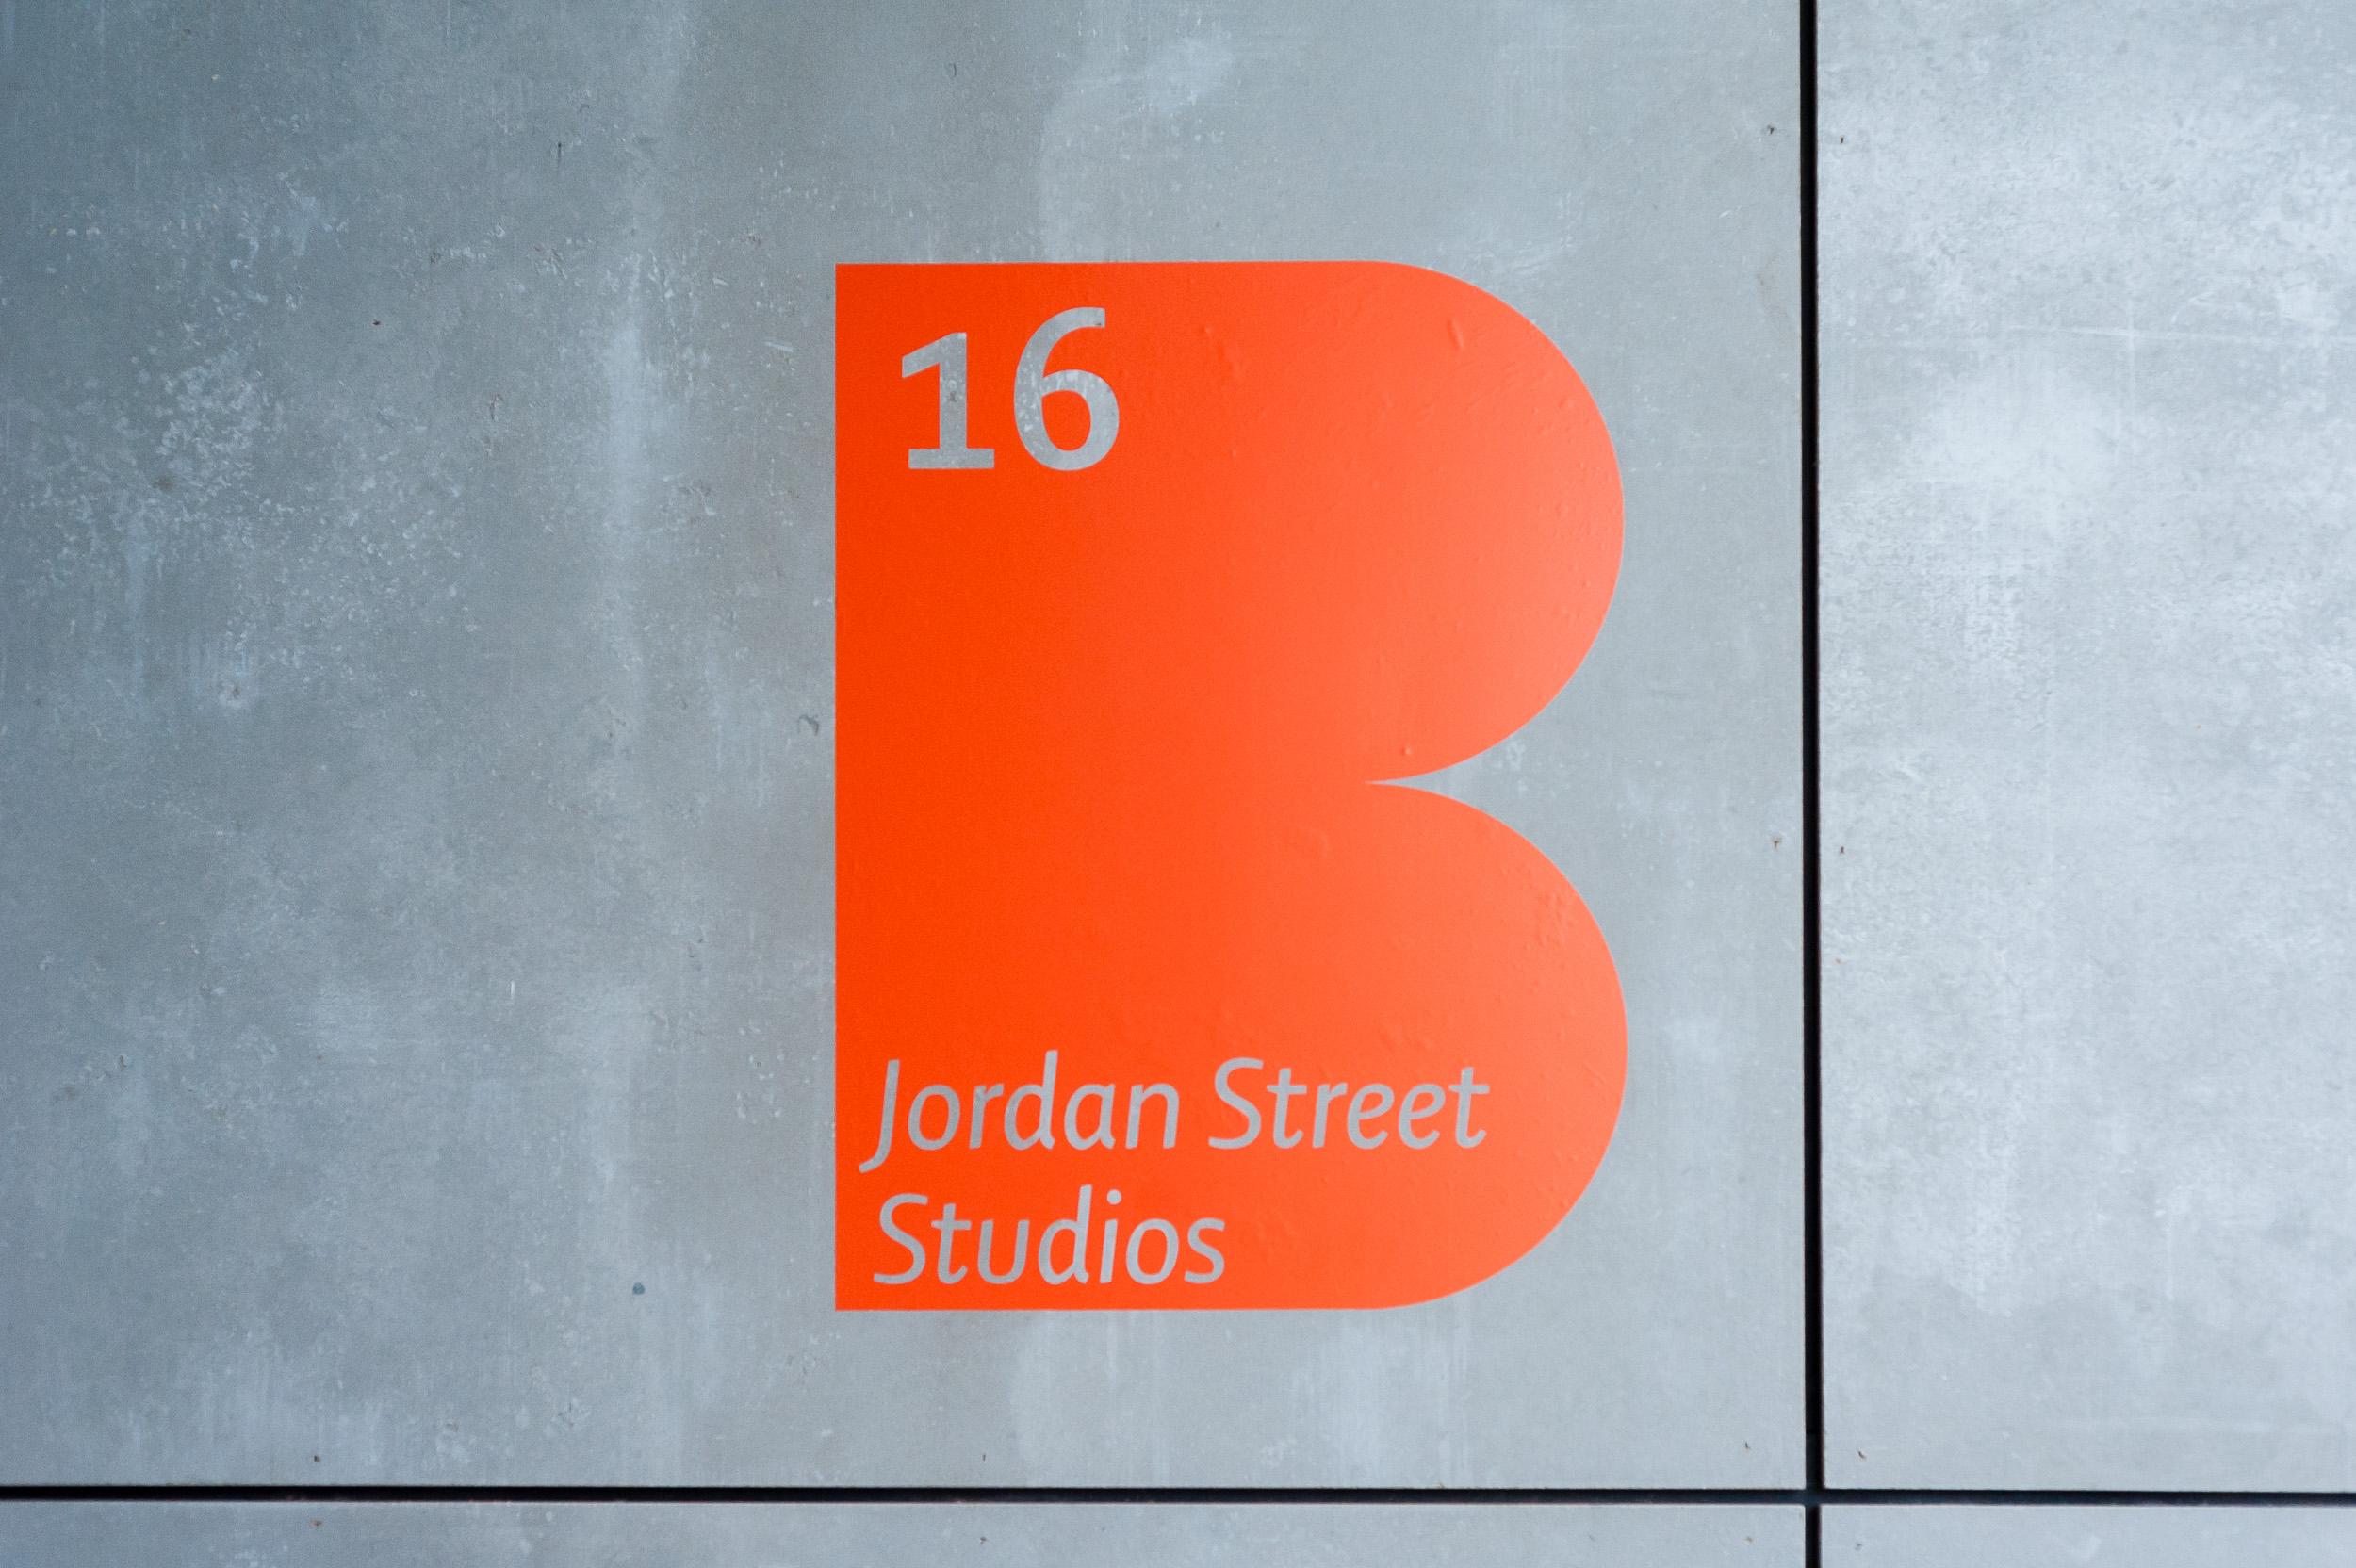 15-Baltic-Studios-3135-pete-carr.jpg